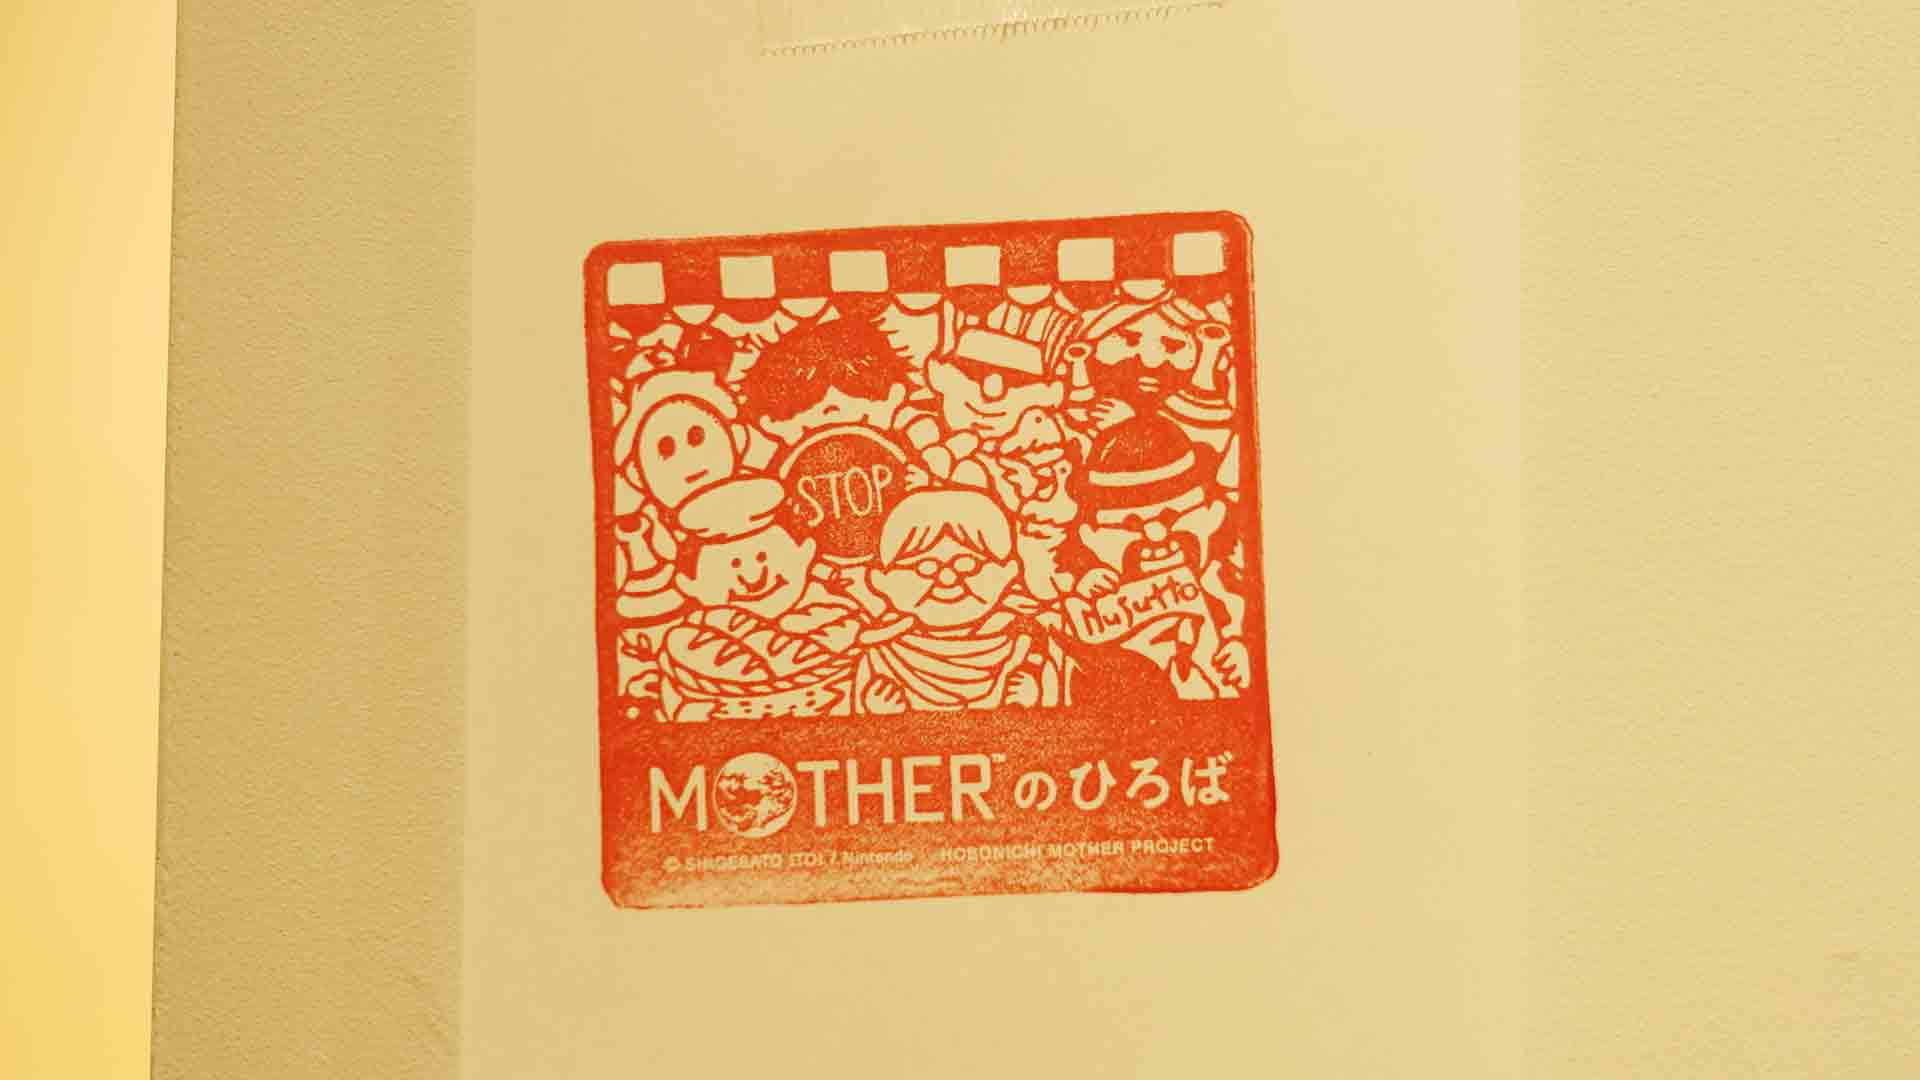 MOTHER2,MOTHERのひろば,ほぼ日,渋谷パルコ,イベント,レトロゲーム